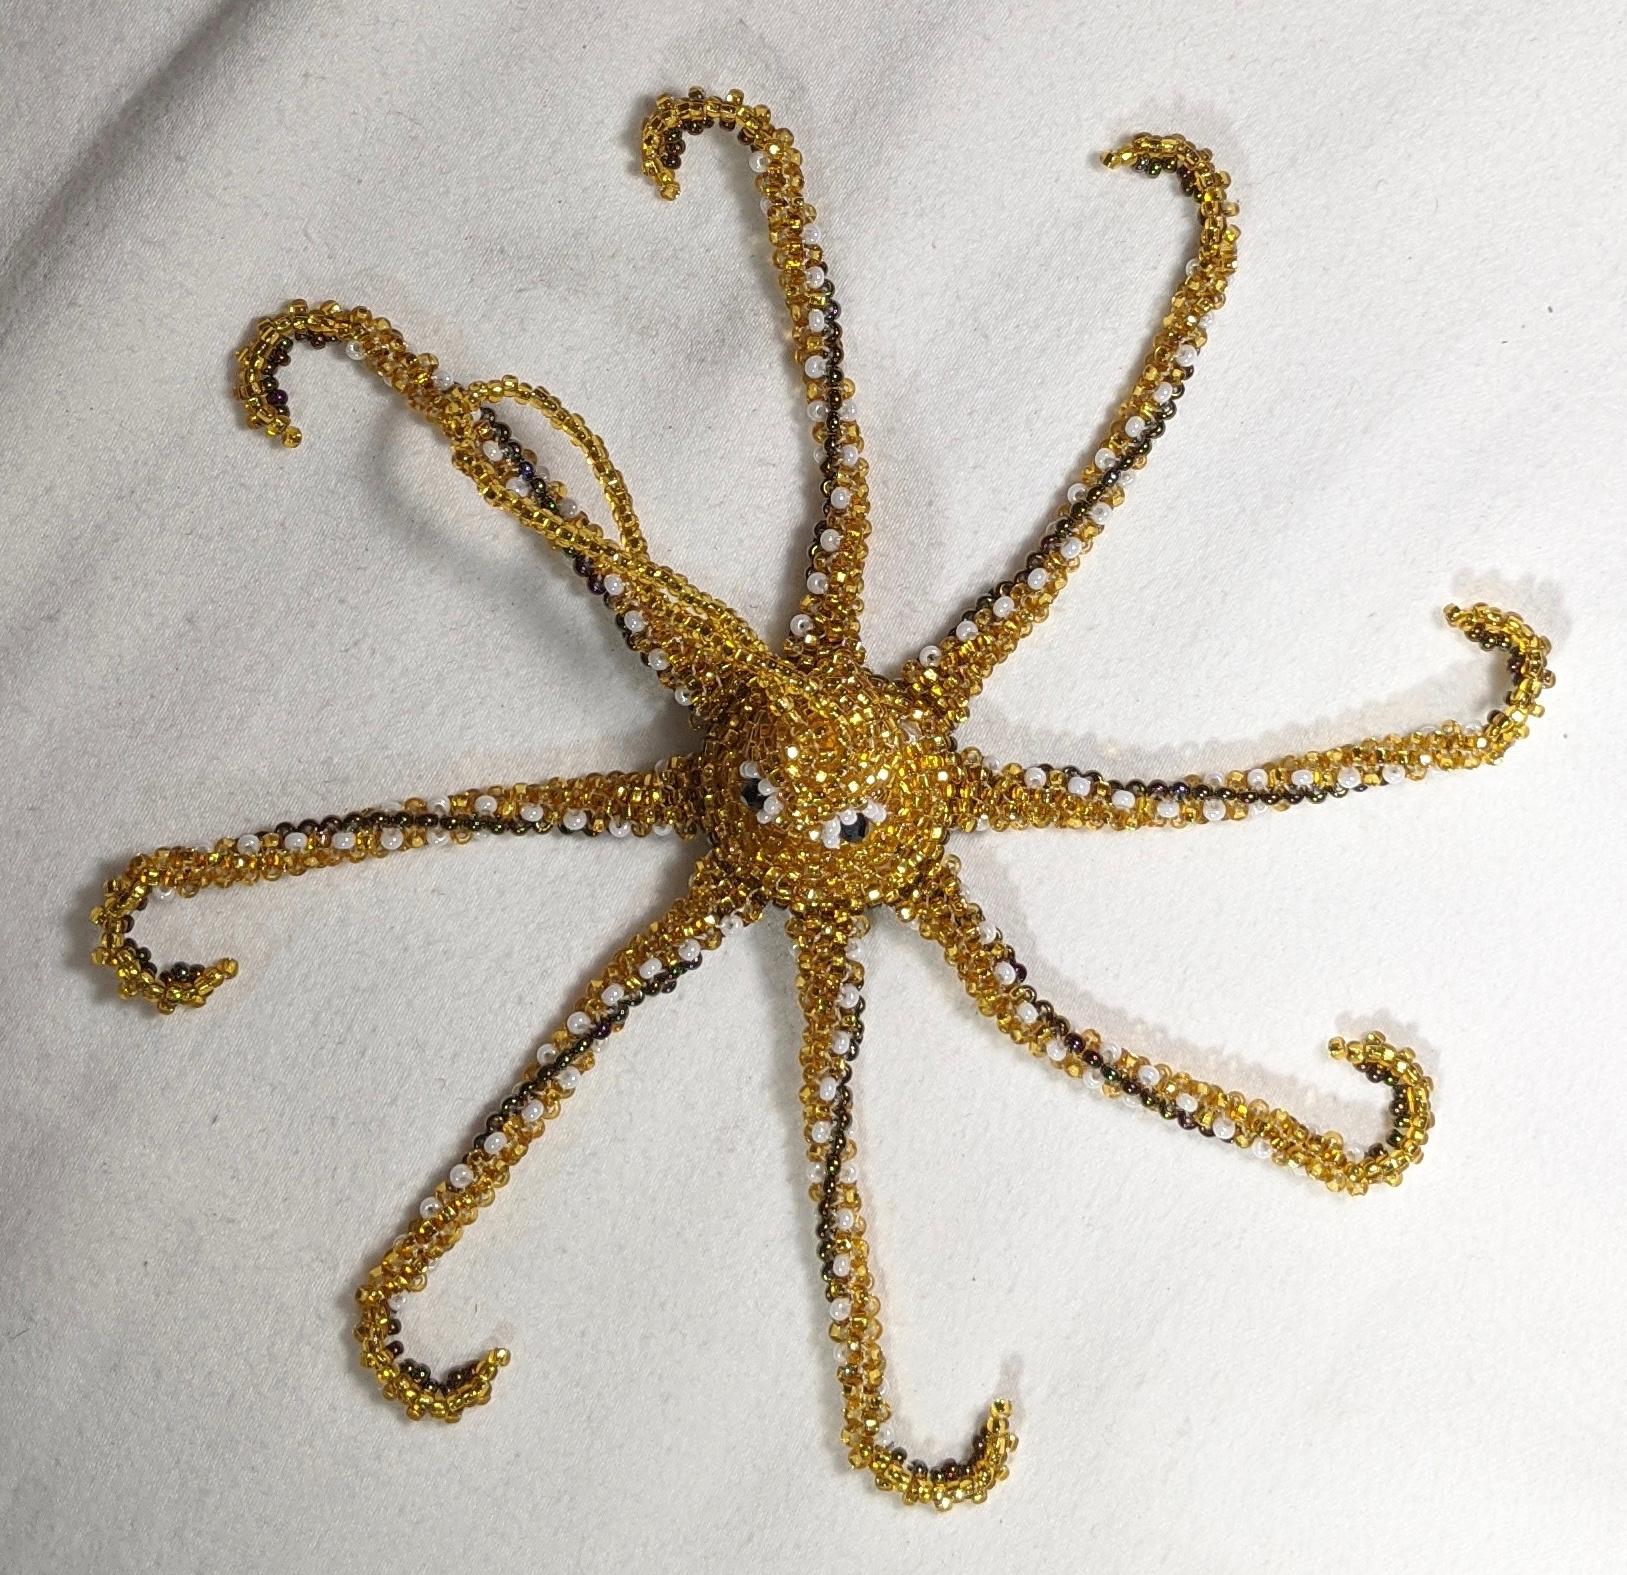 Octopus Beaded Ornament - Light Gold